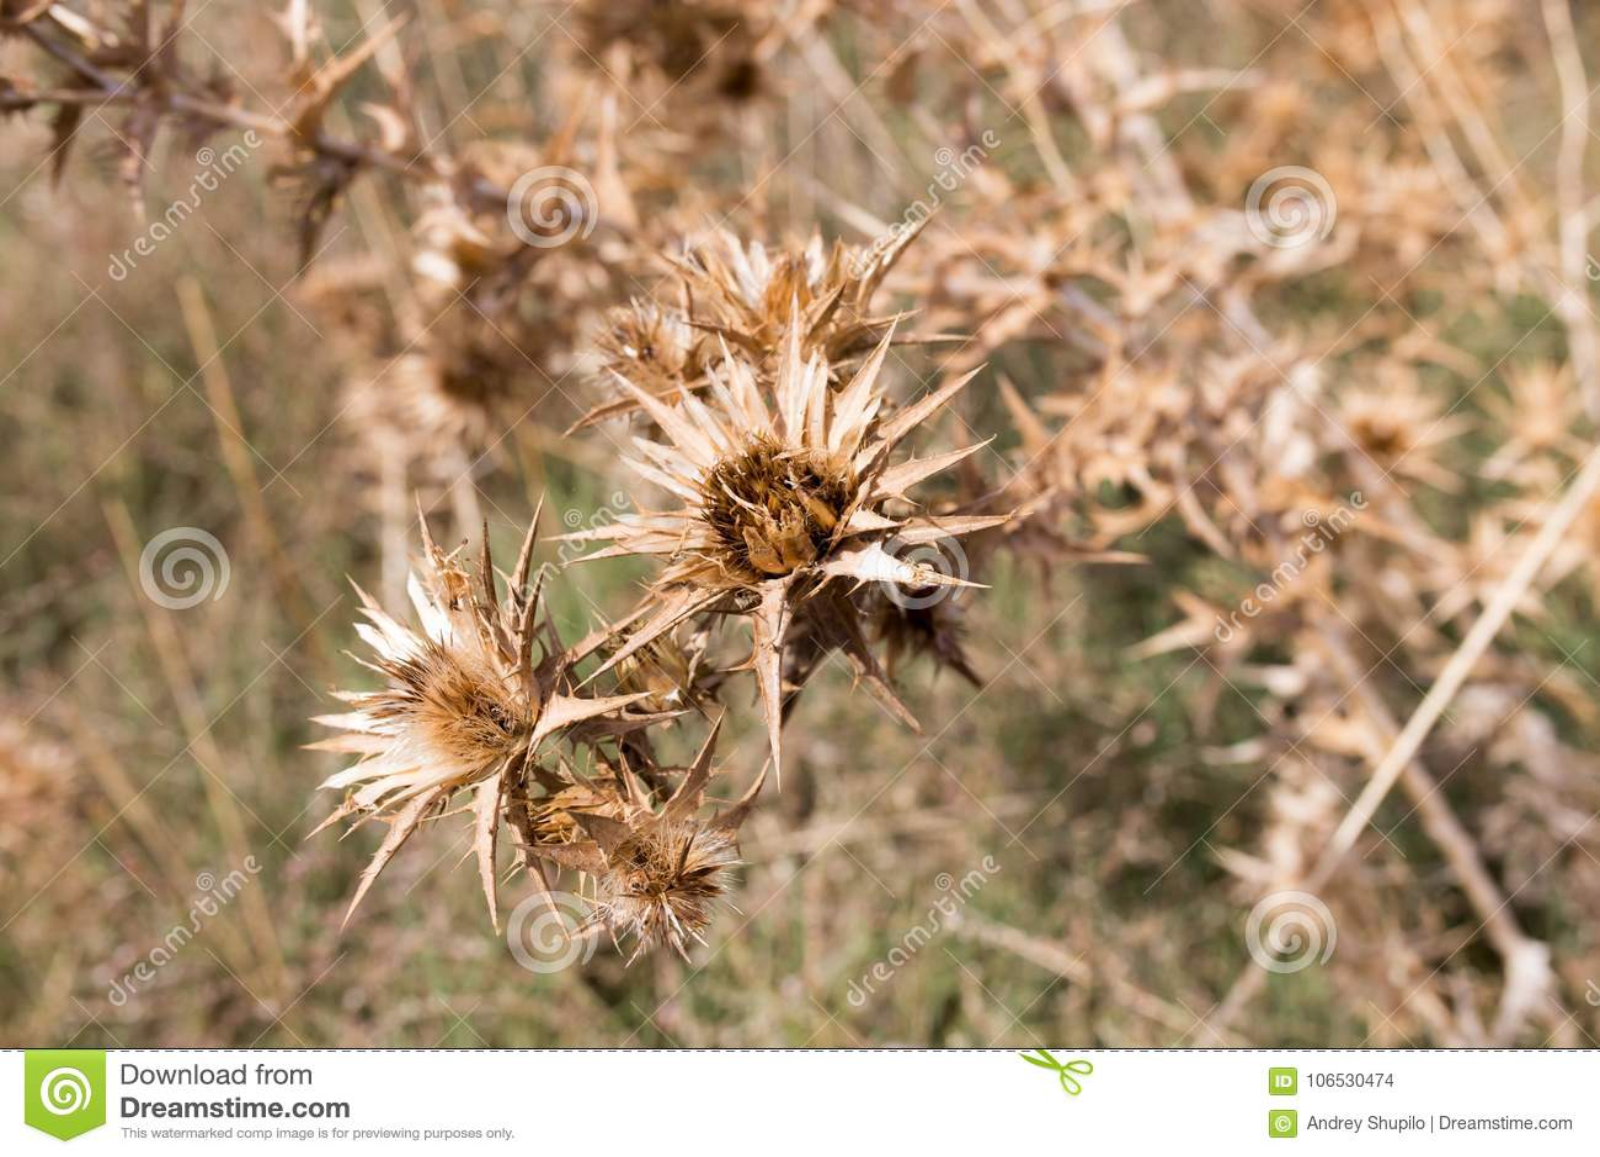 Torrt taggigt gräs utomhus